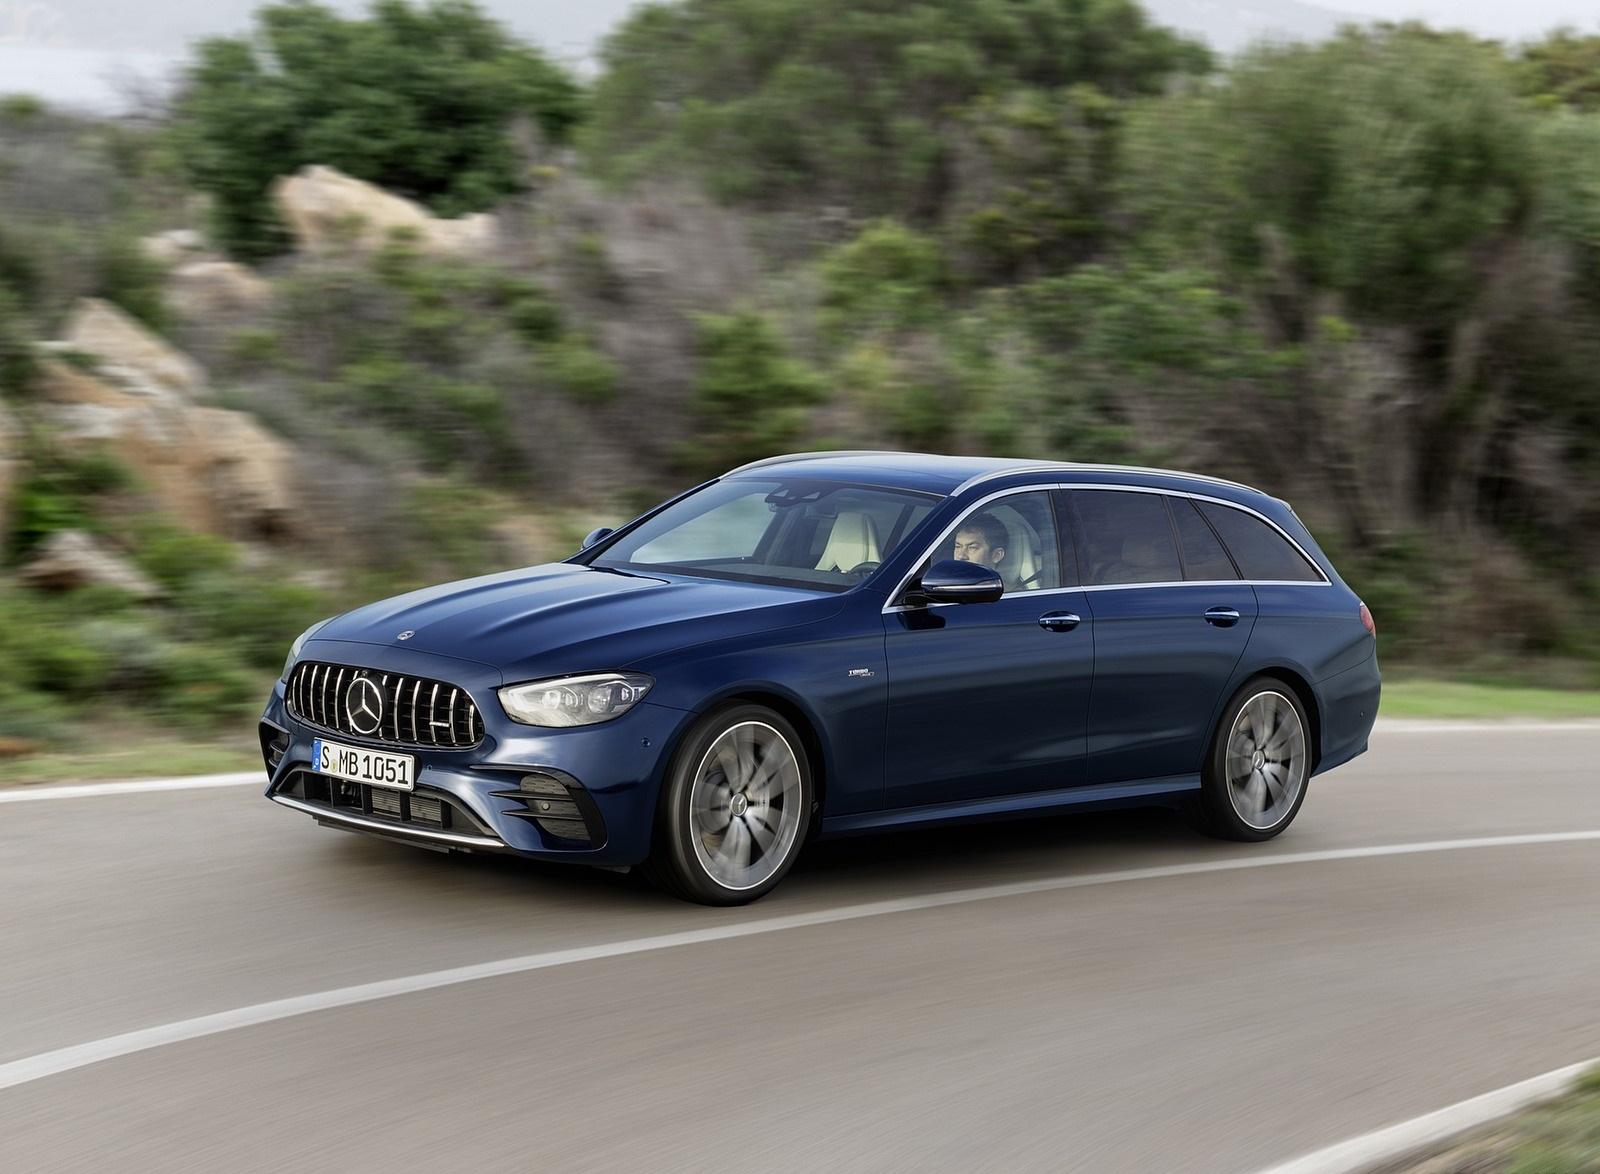 2021 Mercedes-AMG E 53 Estate 4MATIC+ T-Model (Color: Cavansite Blue Metallic) Front Three-Quarter Wallpapers (3)